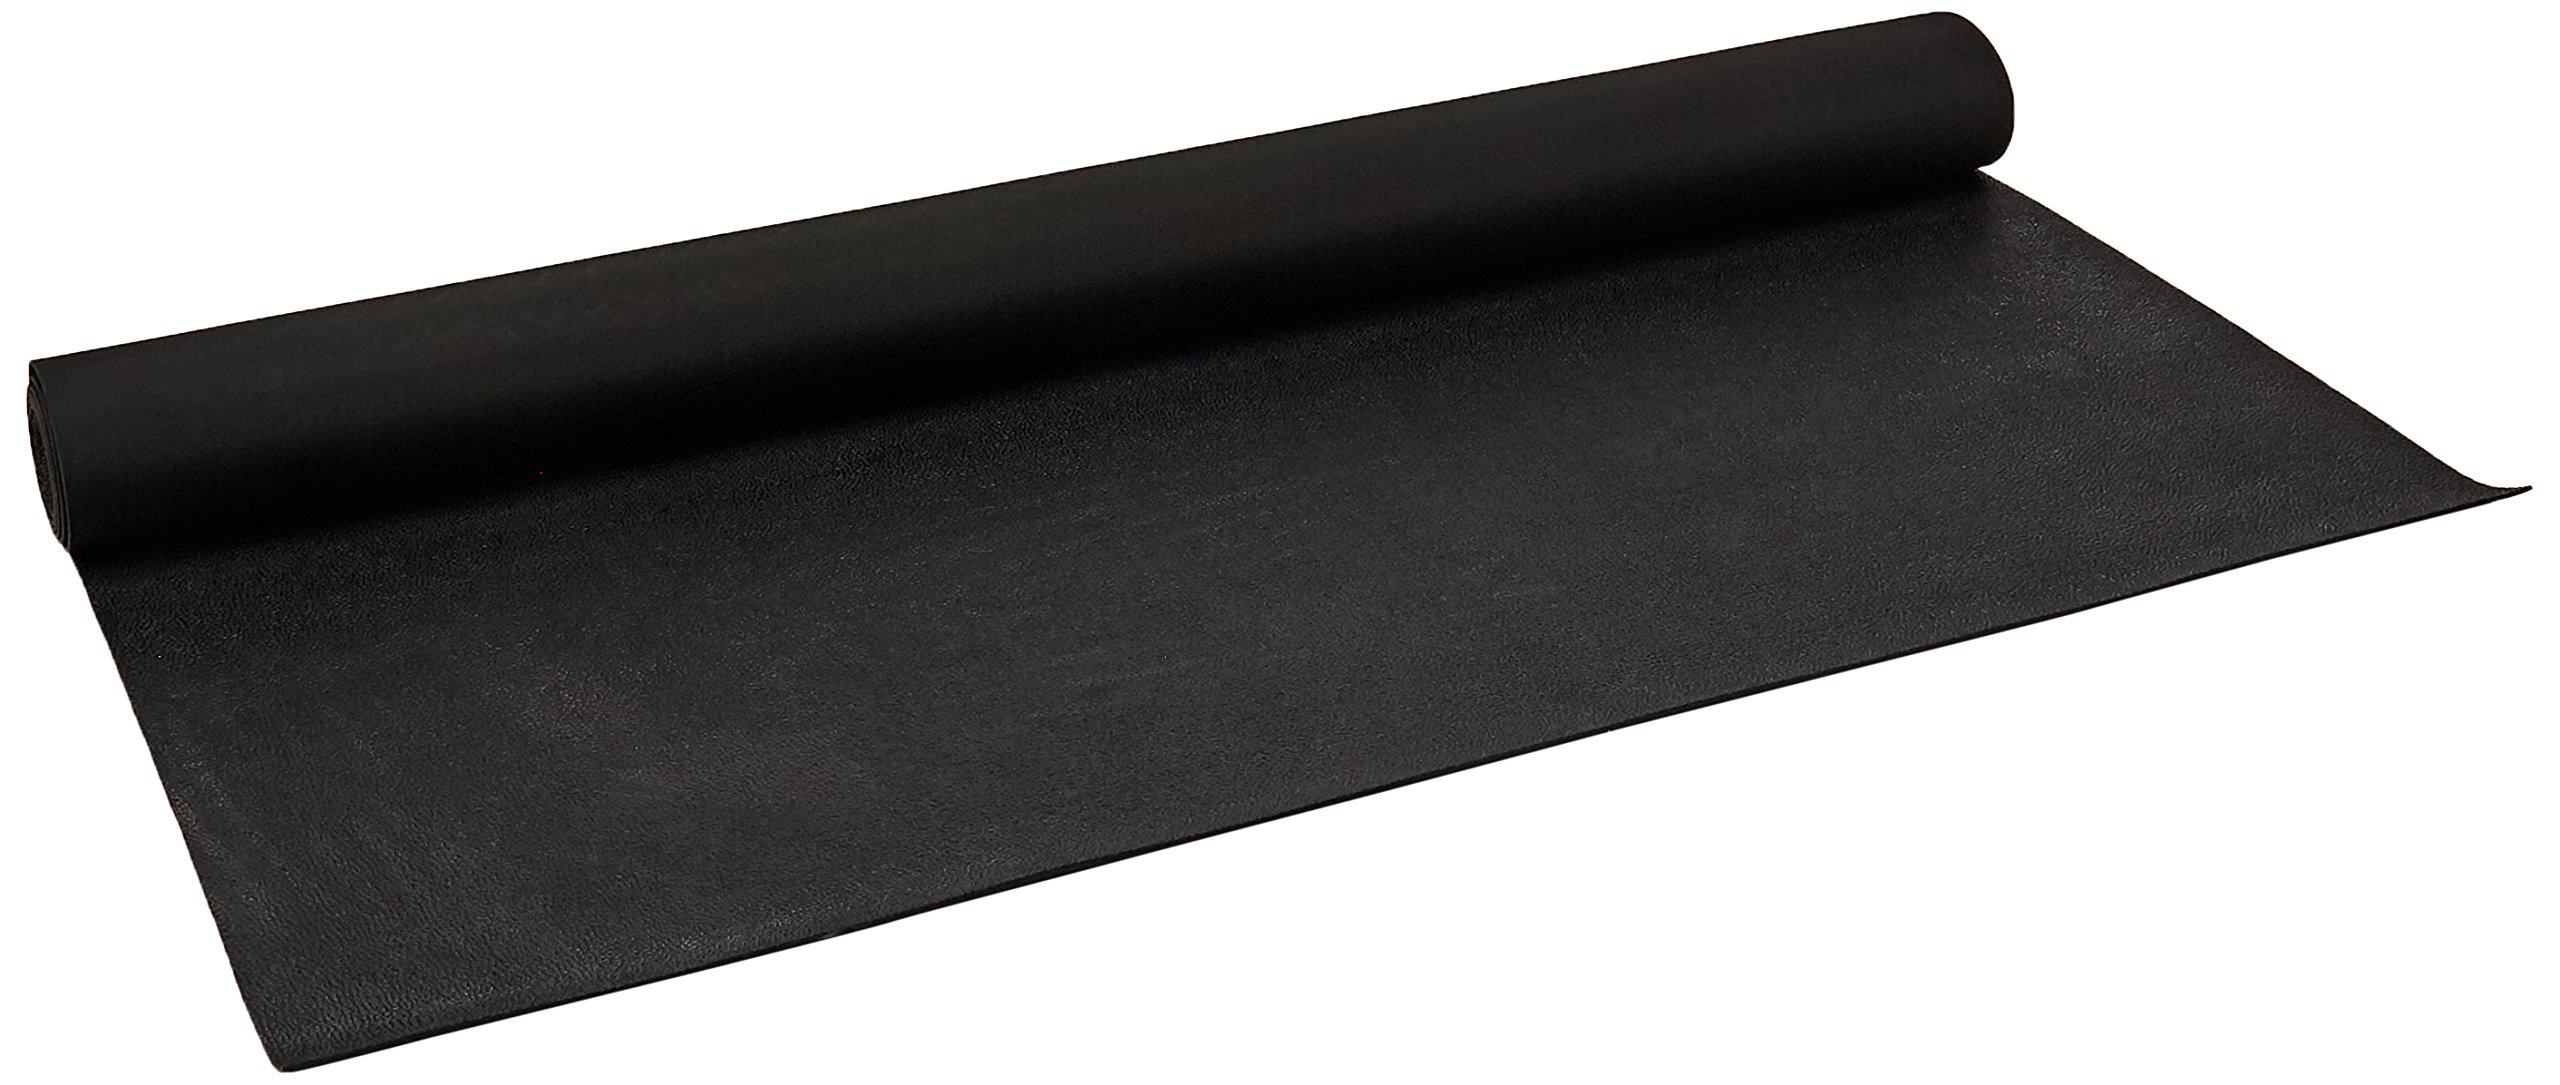 Rubber-Cal Tuff-N-Lastic Rubber Flooring Runners, 1/8-Inch x 4 x 10-Feet, Black